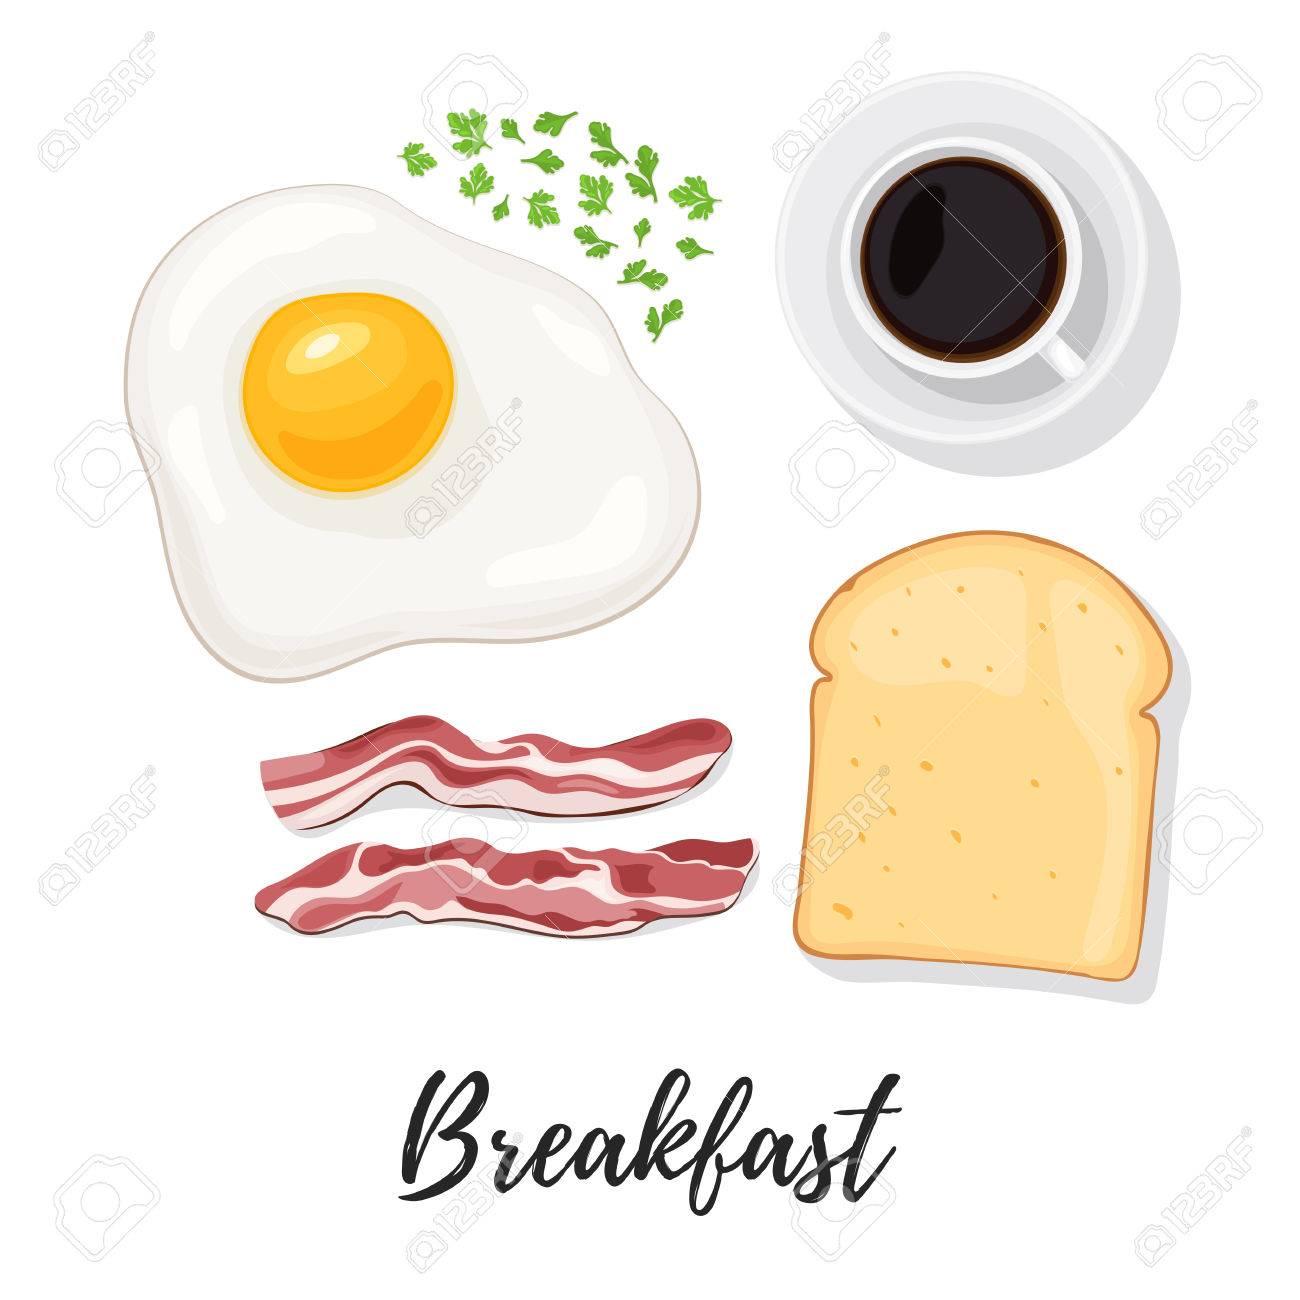 Breakfast Food Egg Scrambled Eggs Bacon Bread Toast Herbs